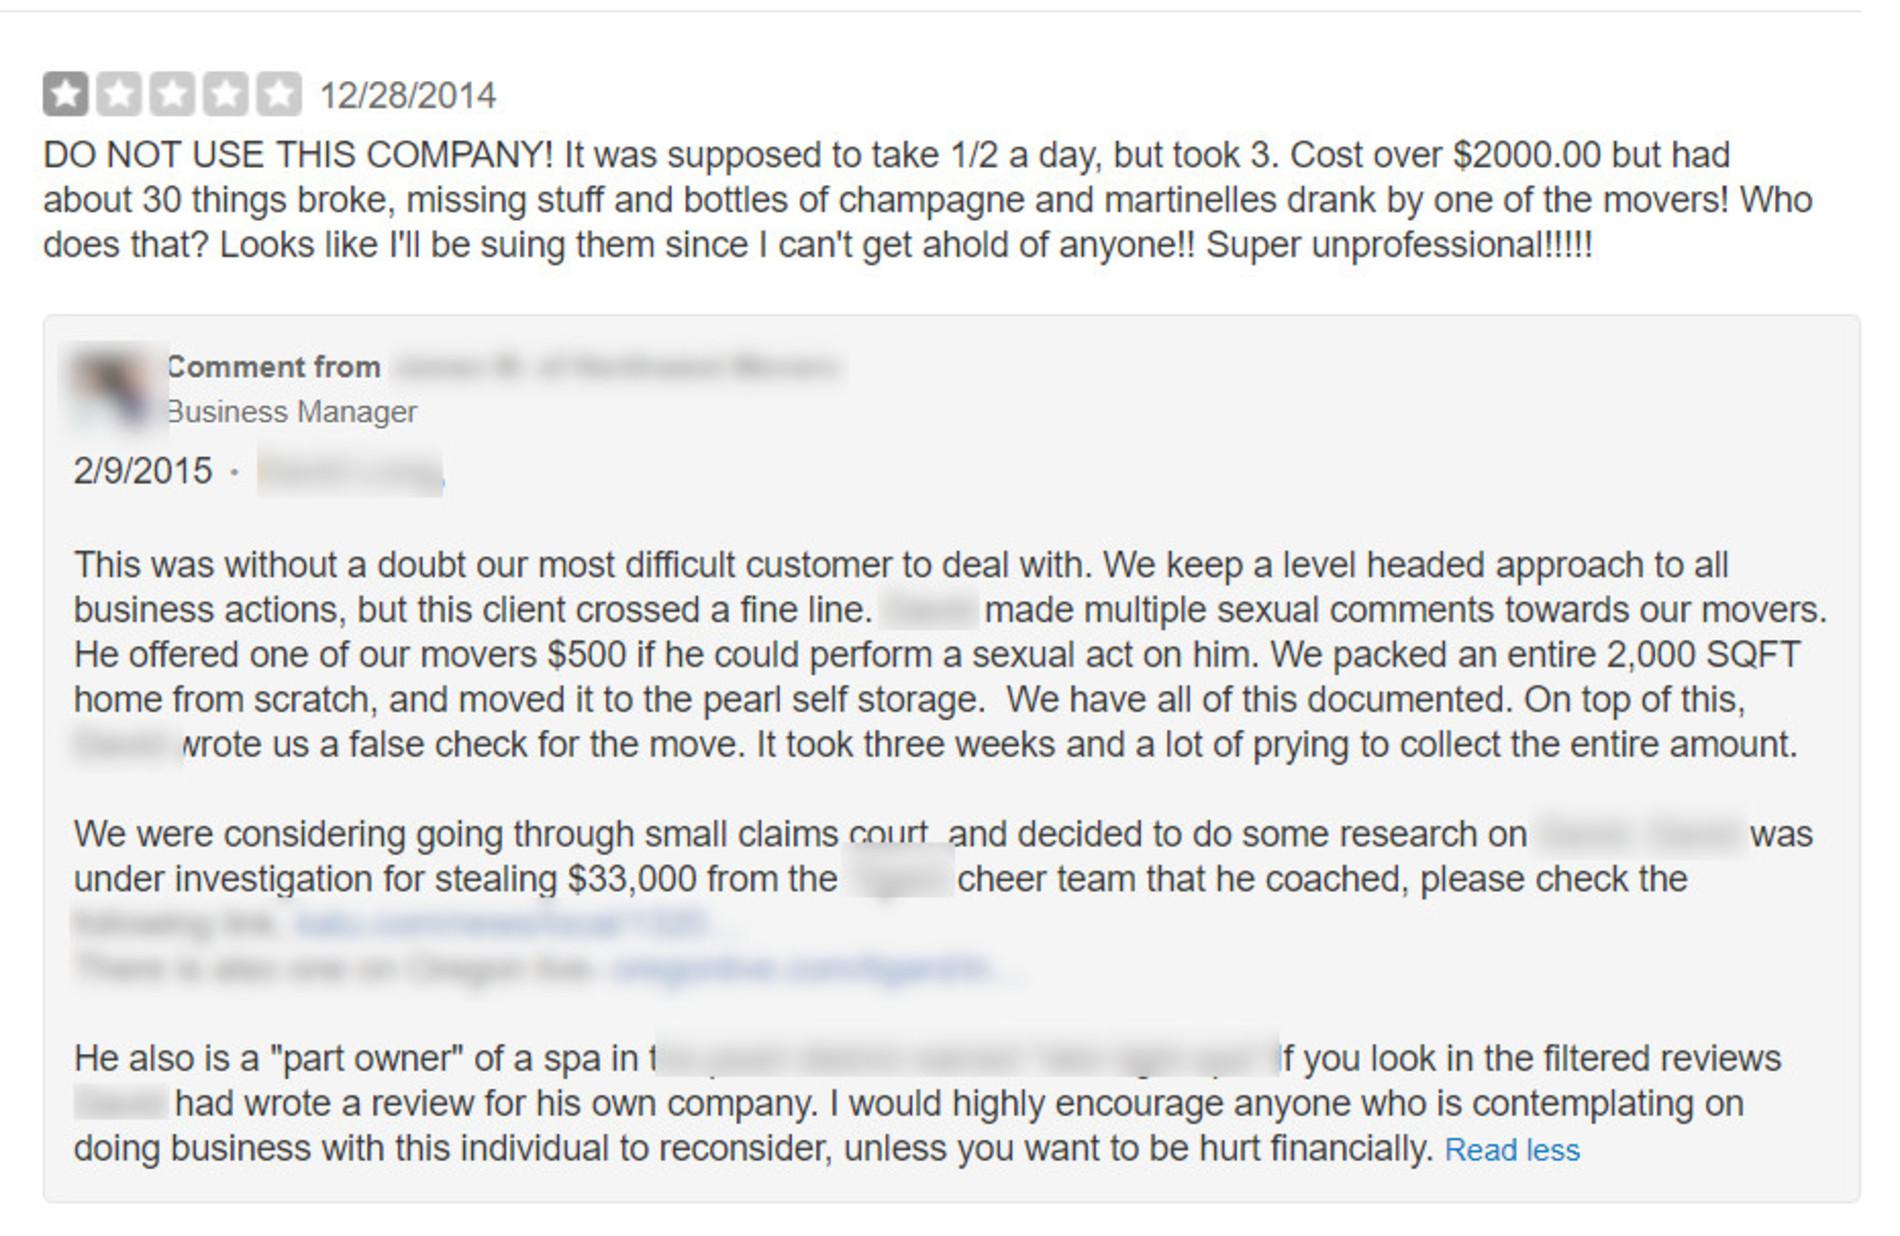 Negative review left online.